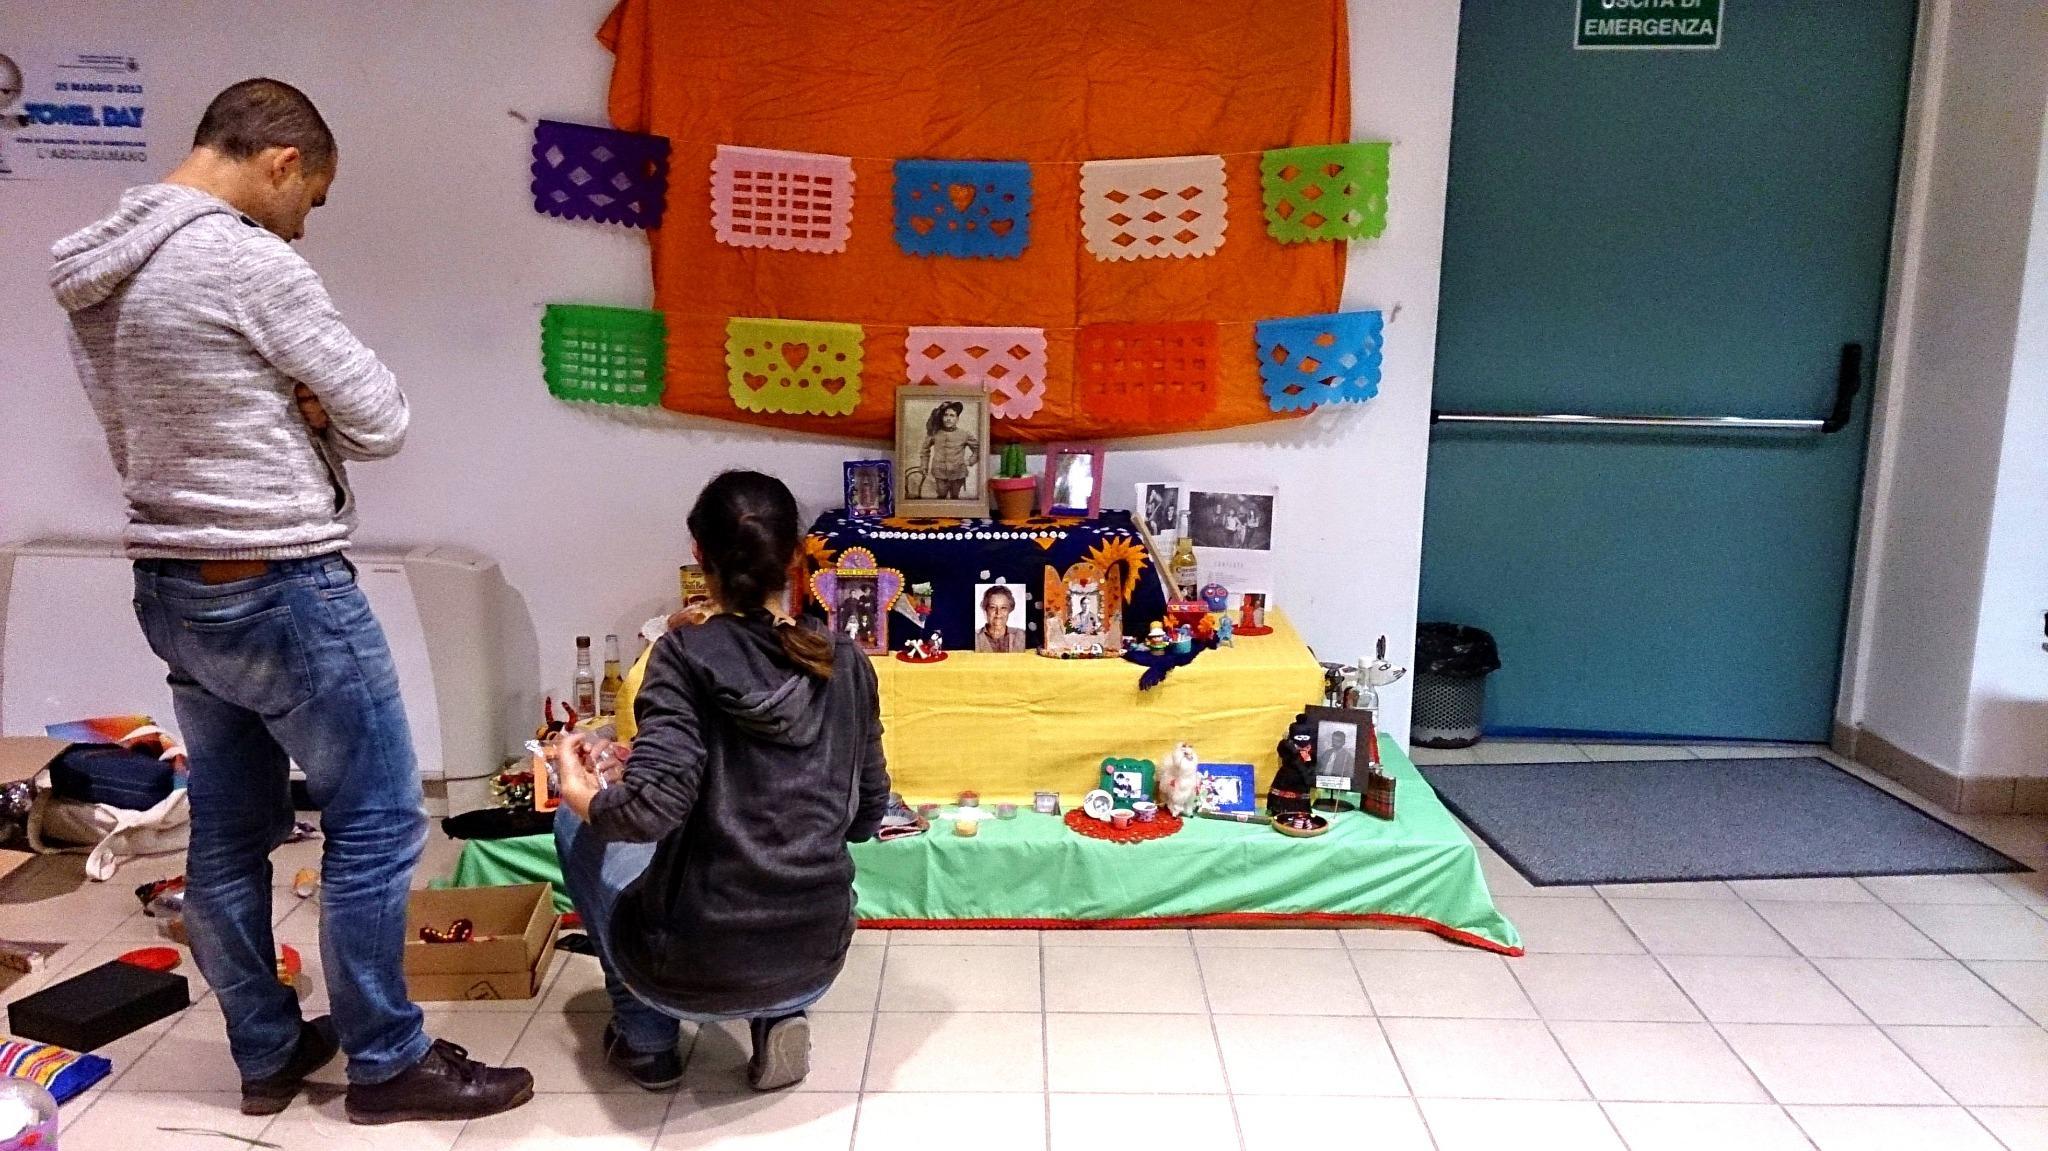 Chi è Dezayeppa? - Altar de muertos Biblioteca Falconara